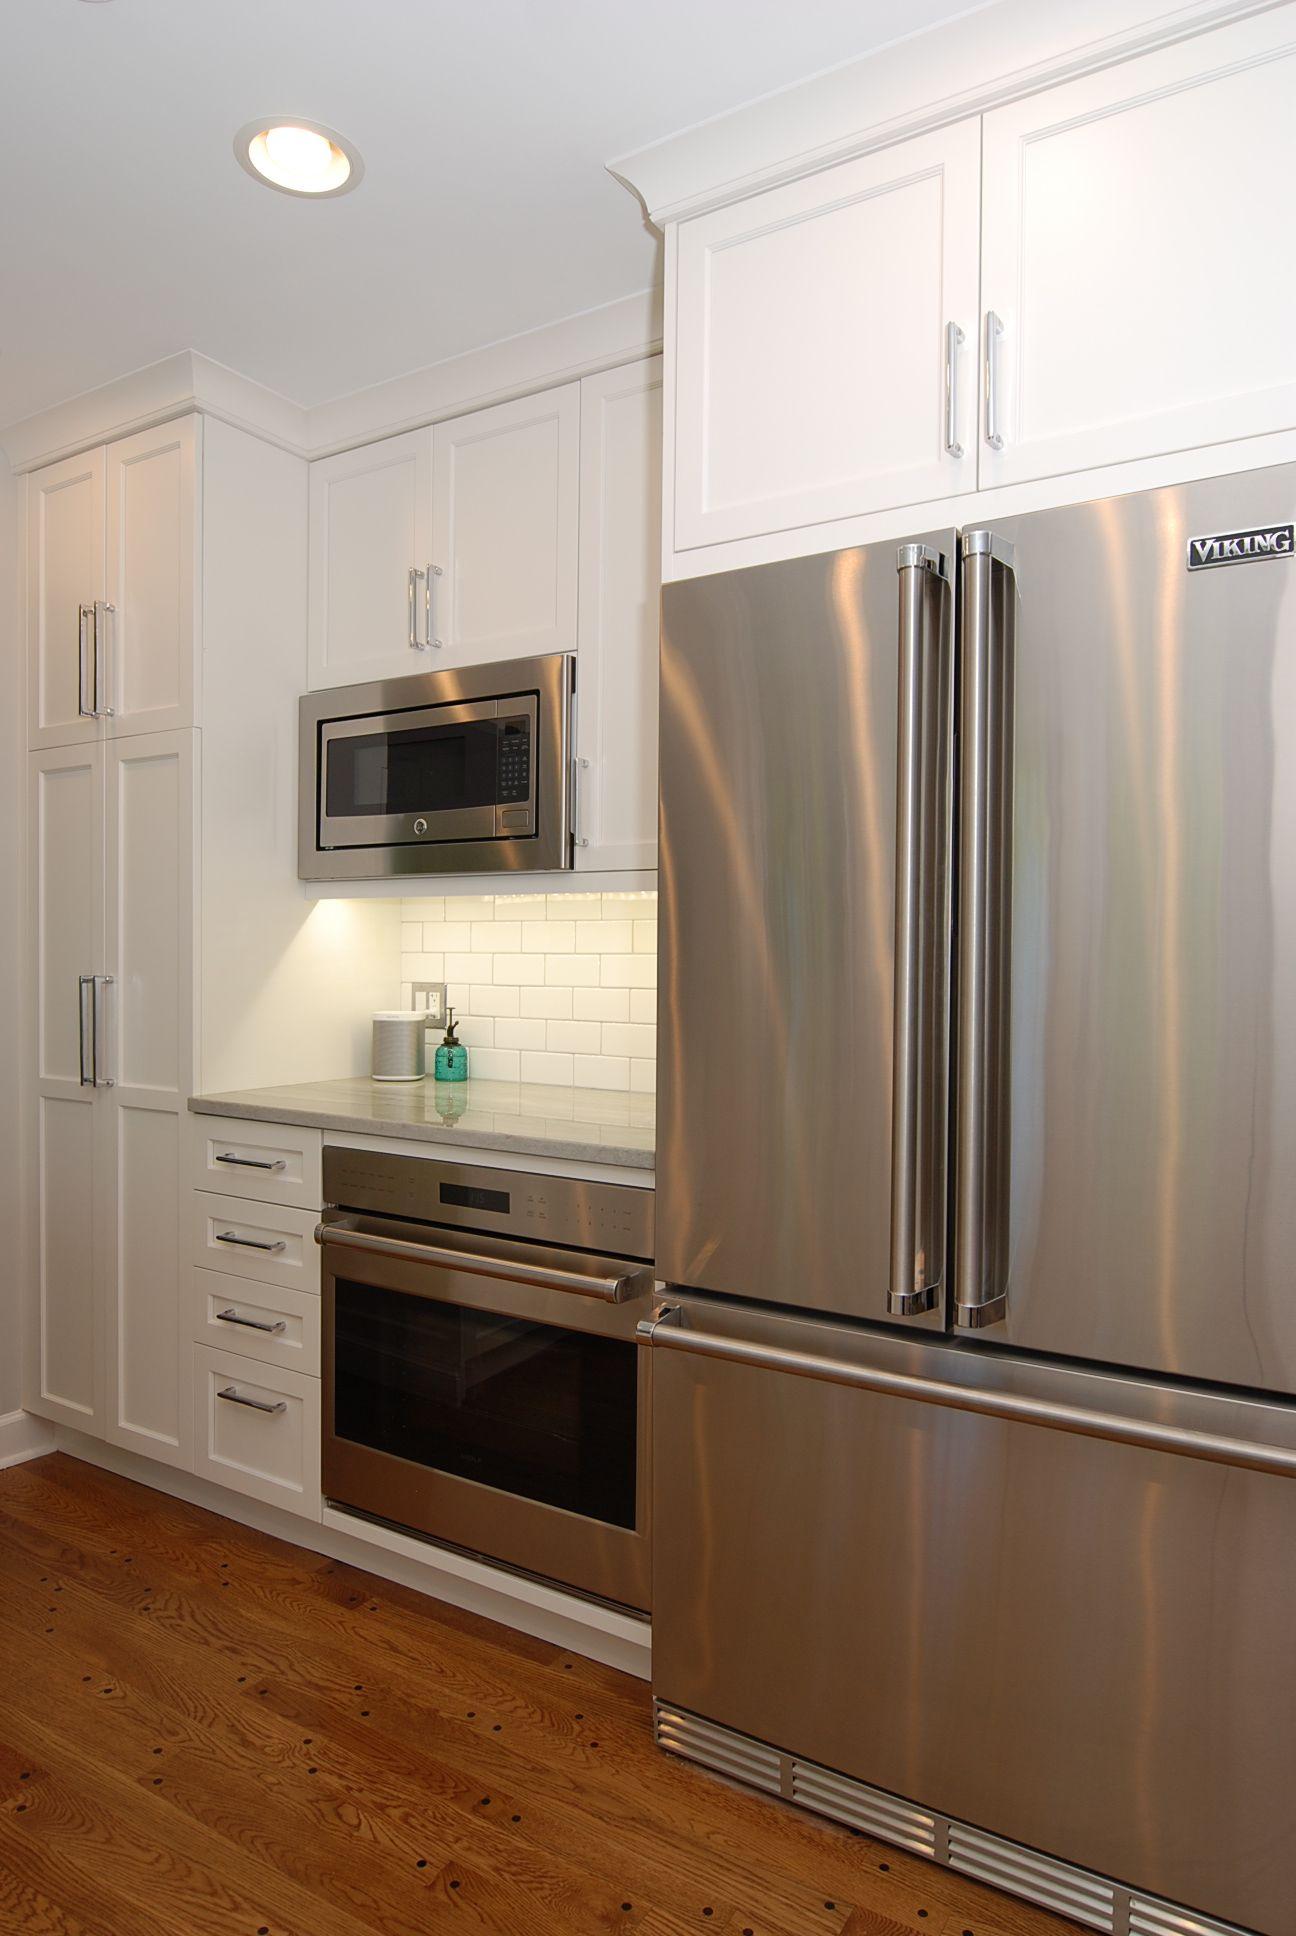 kitchen appliances counter oven